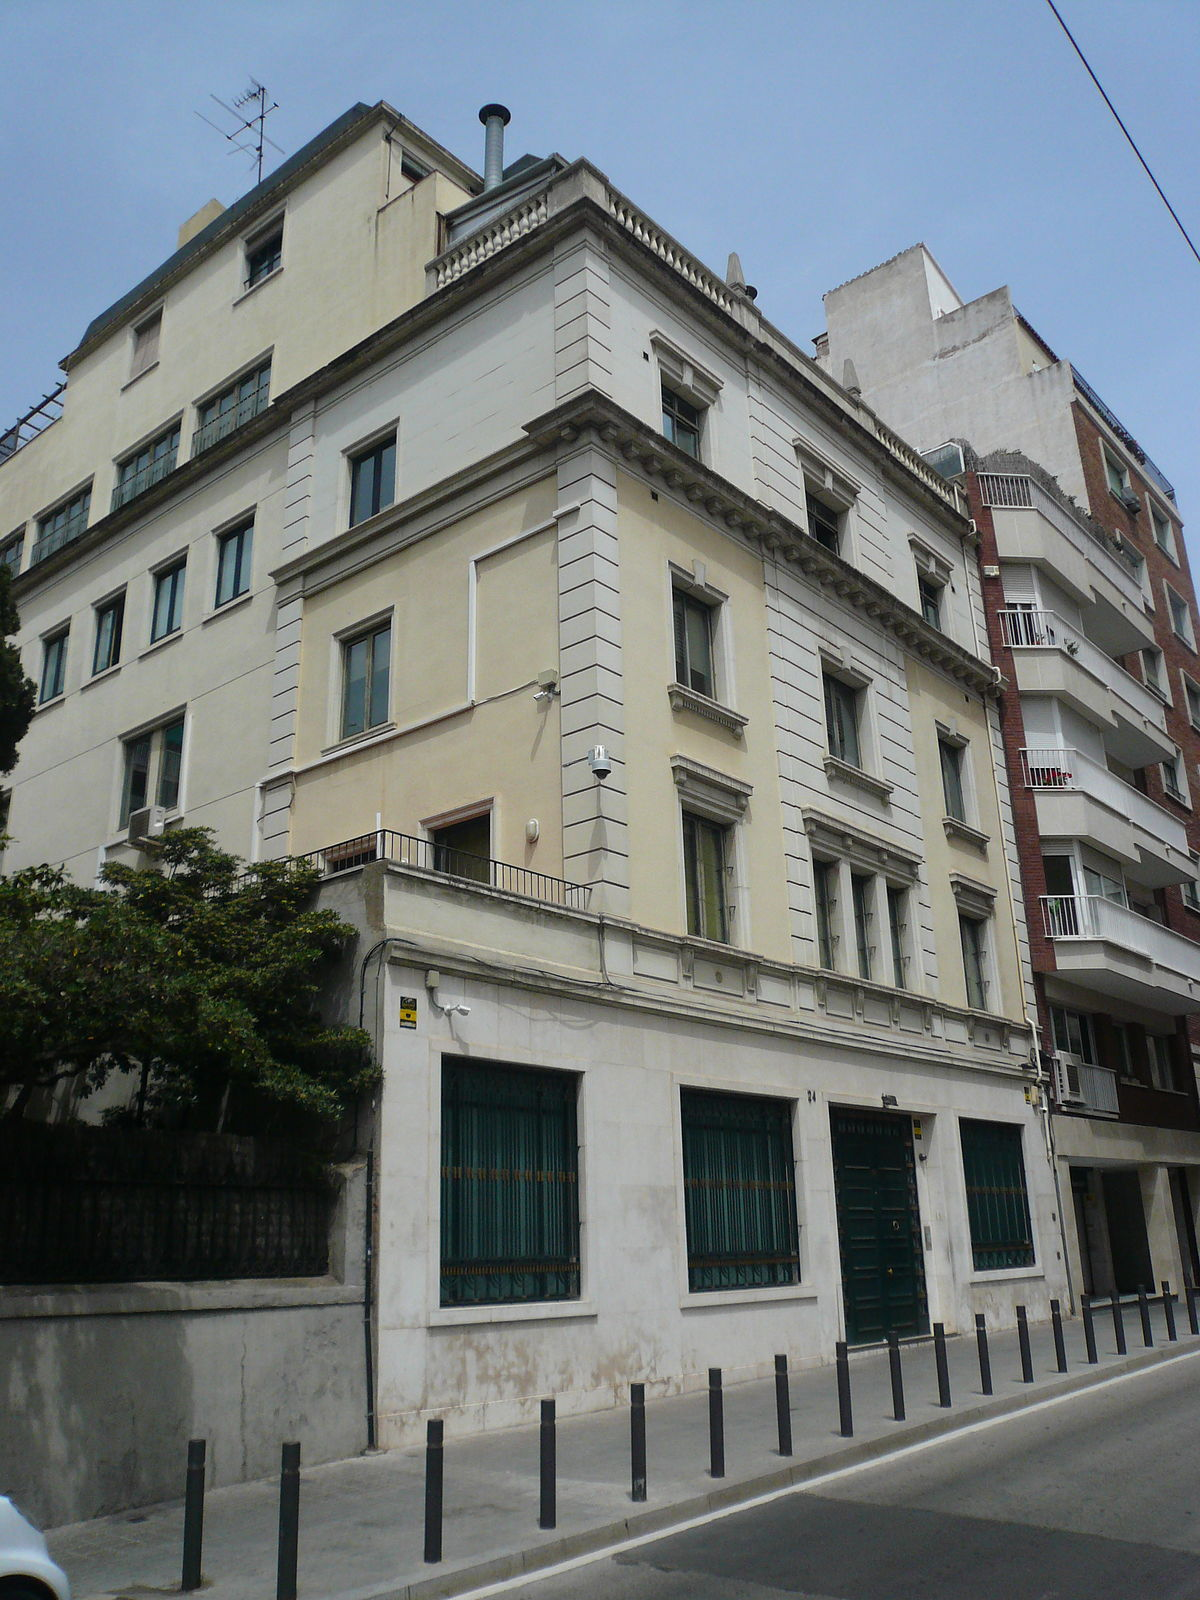 synagogue of barcelona wikipedia